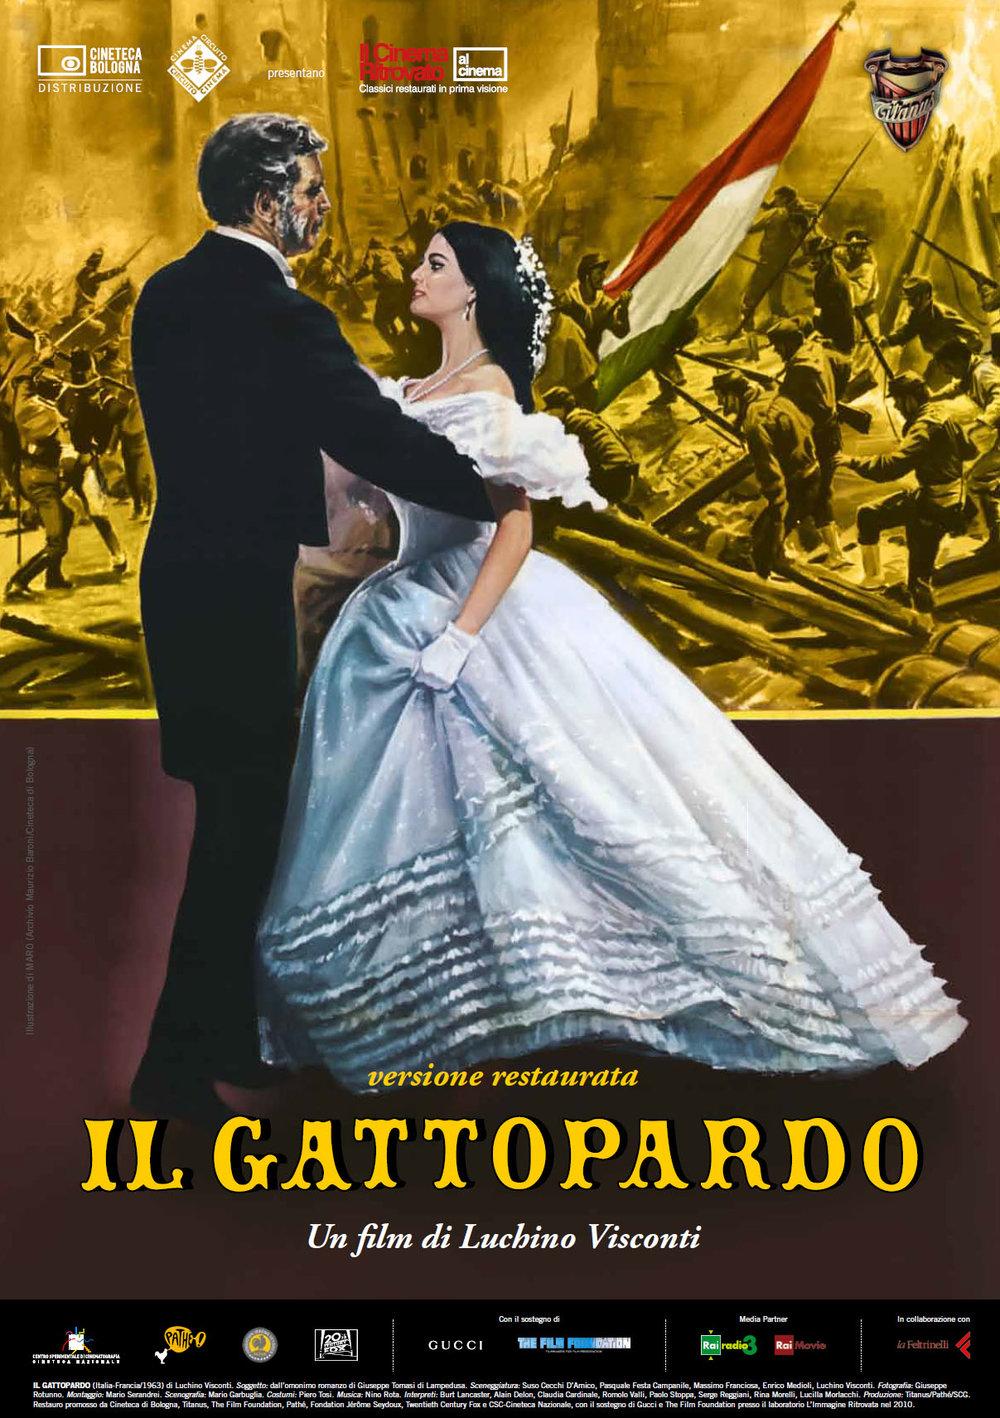 104 Il_Gattopardo_fair use movie poster.jpg